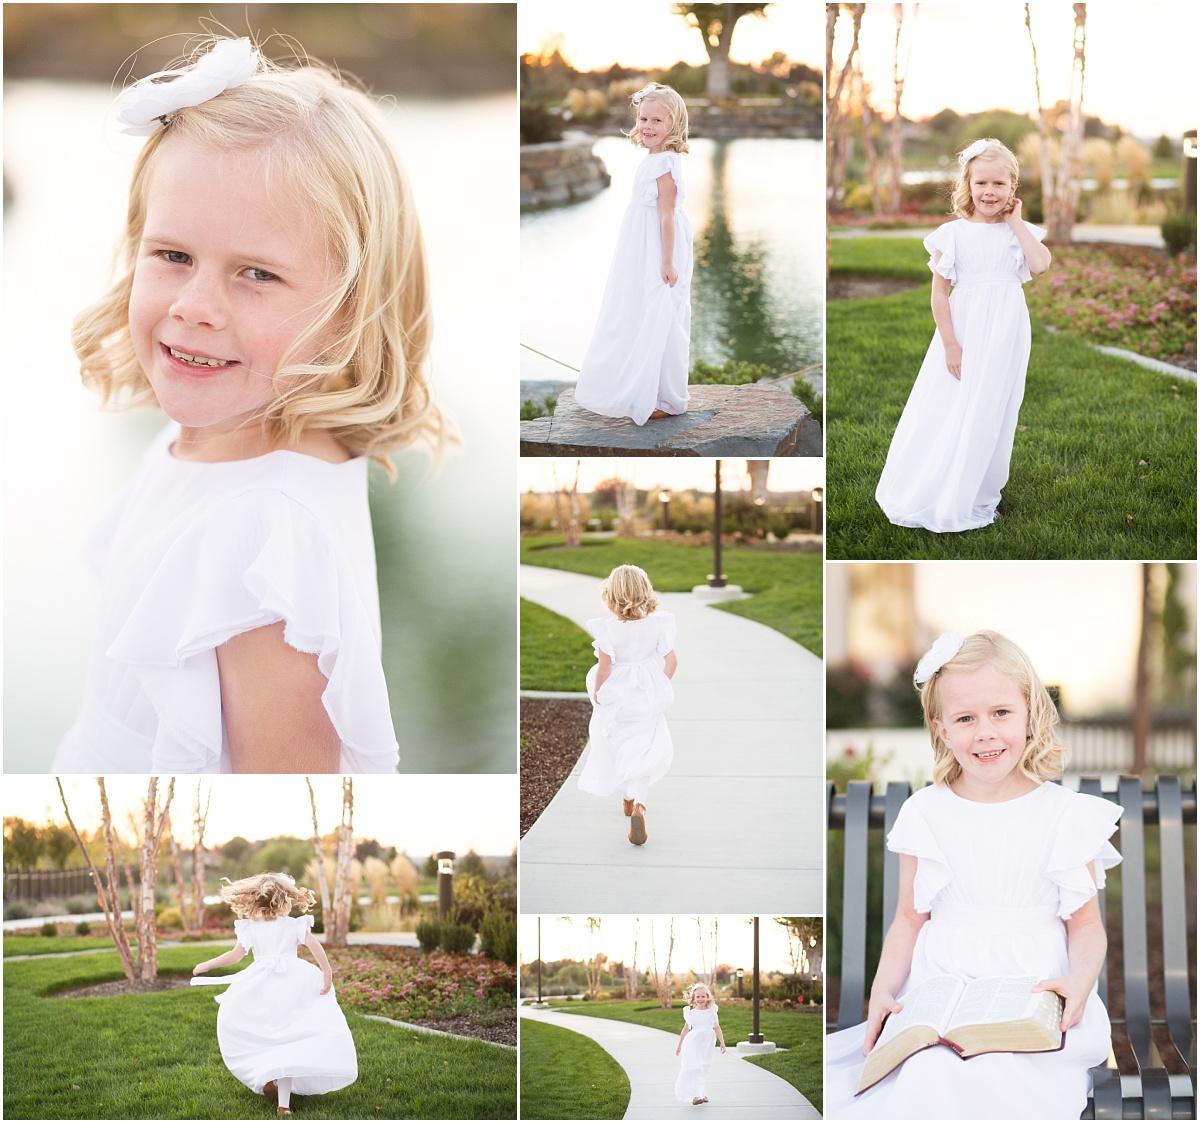 Polson Family_Leah Southwick Photography_0006.jpg